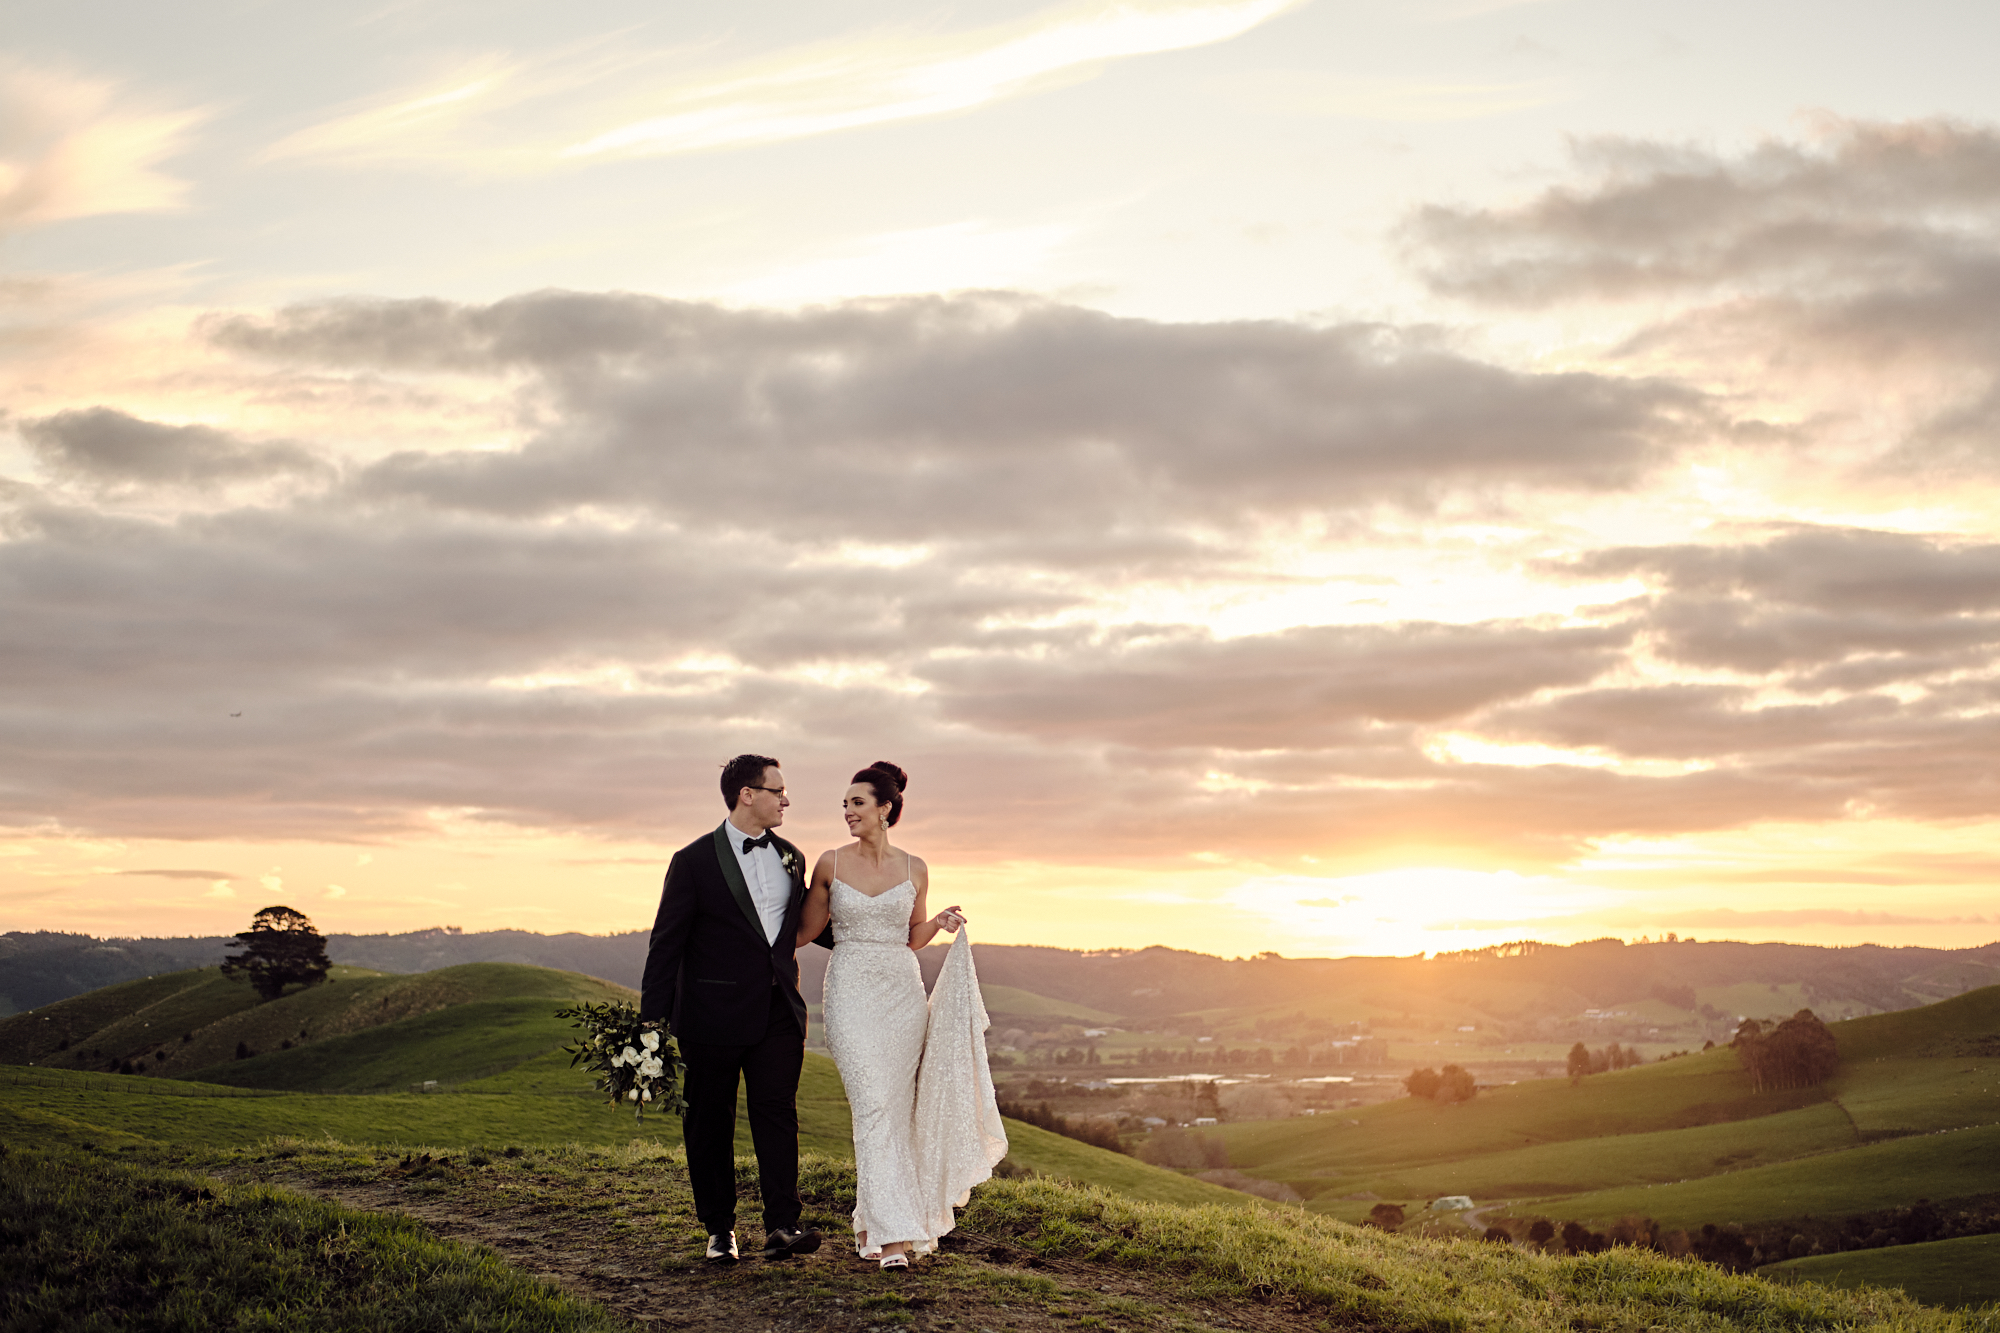 Sunset at wedding venue